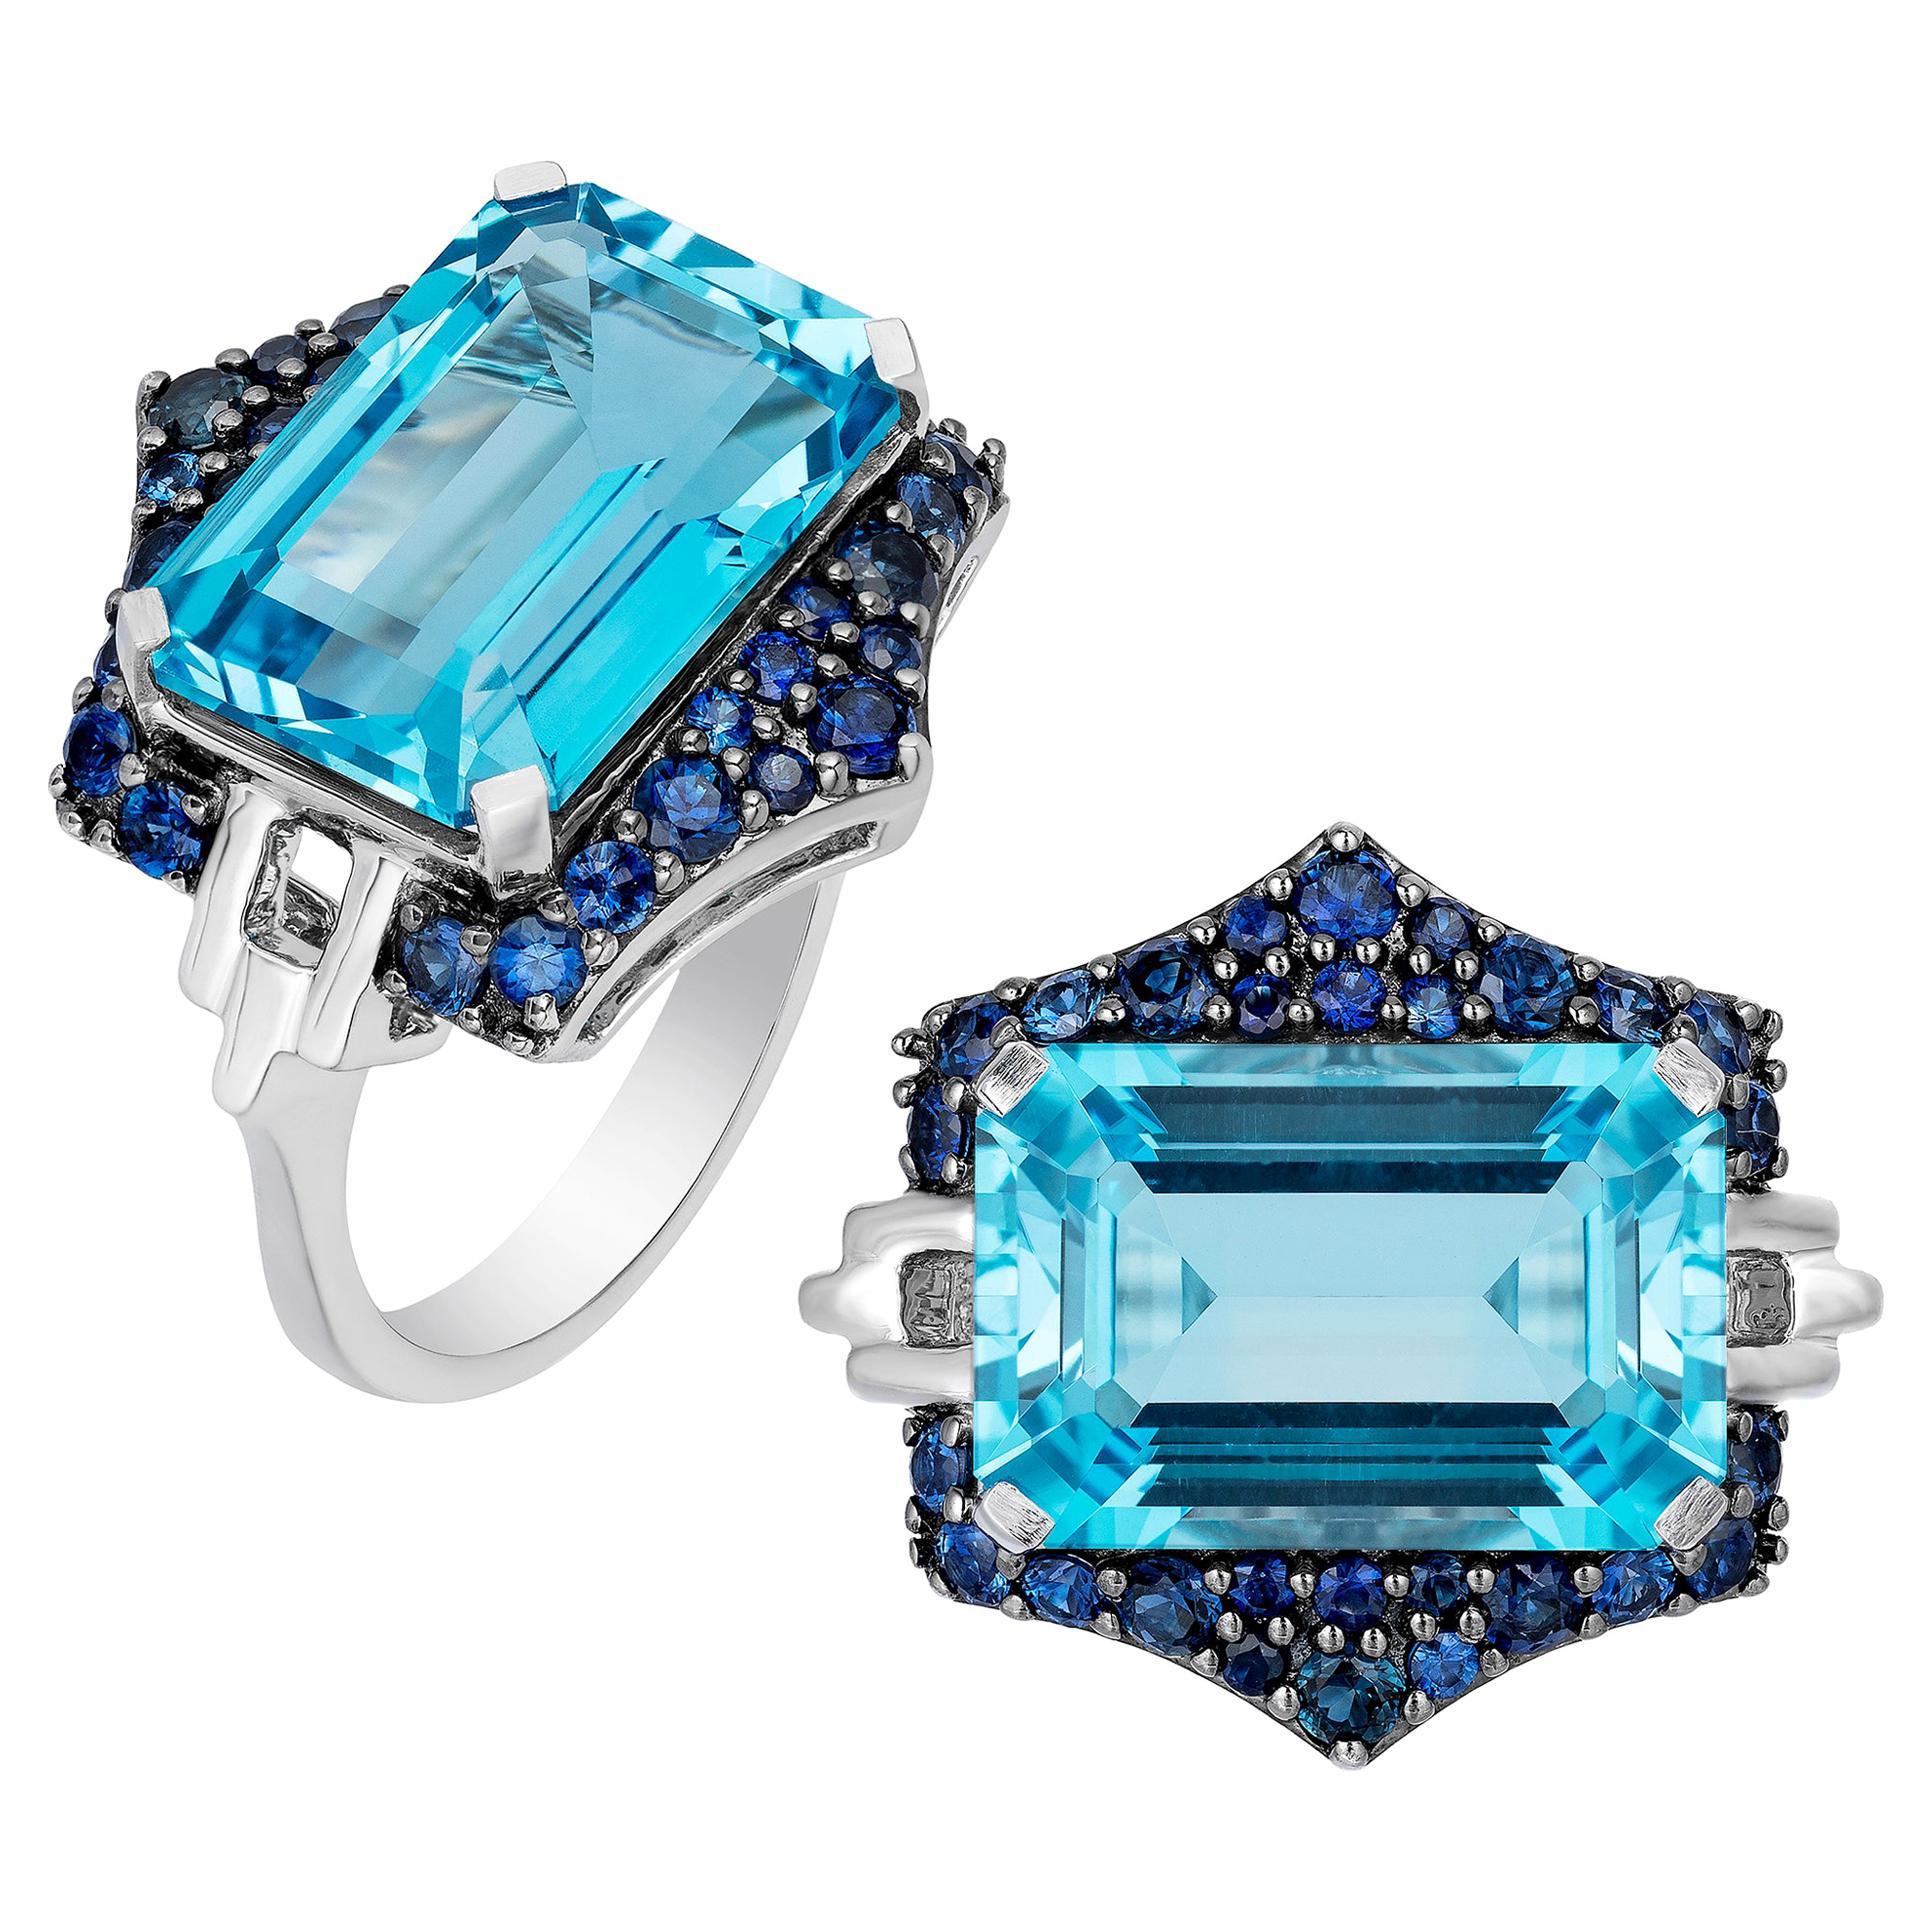 Goshwara Blue Topaz and Blue Sapphire Ring